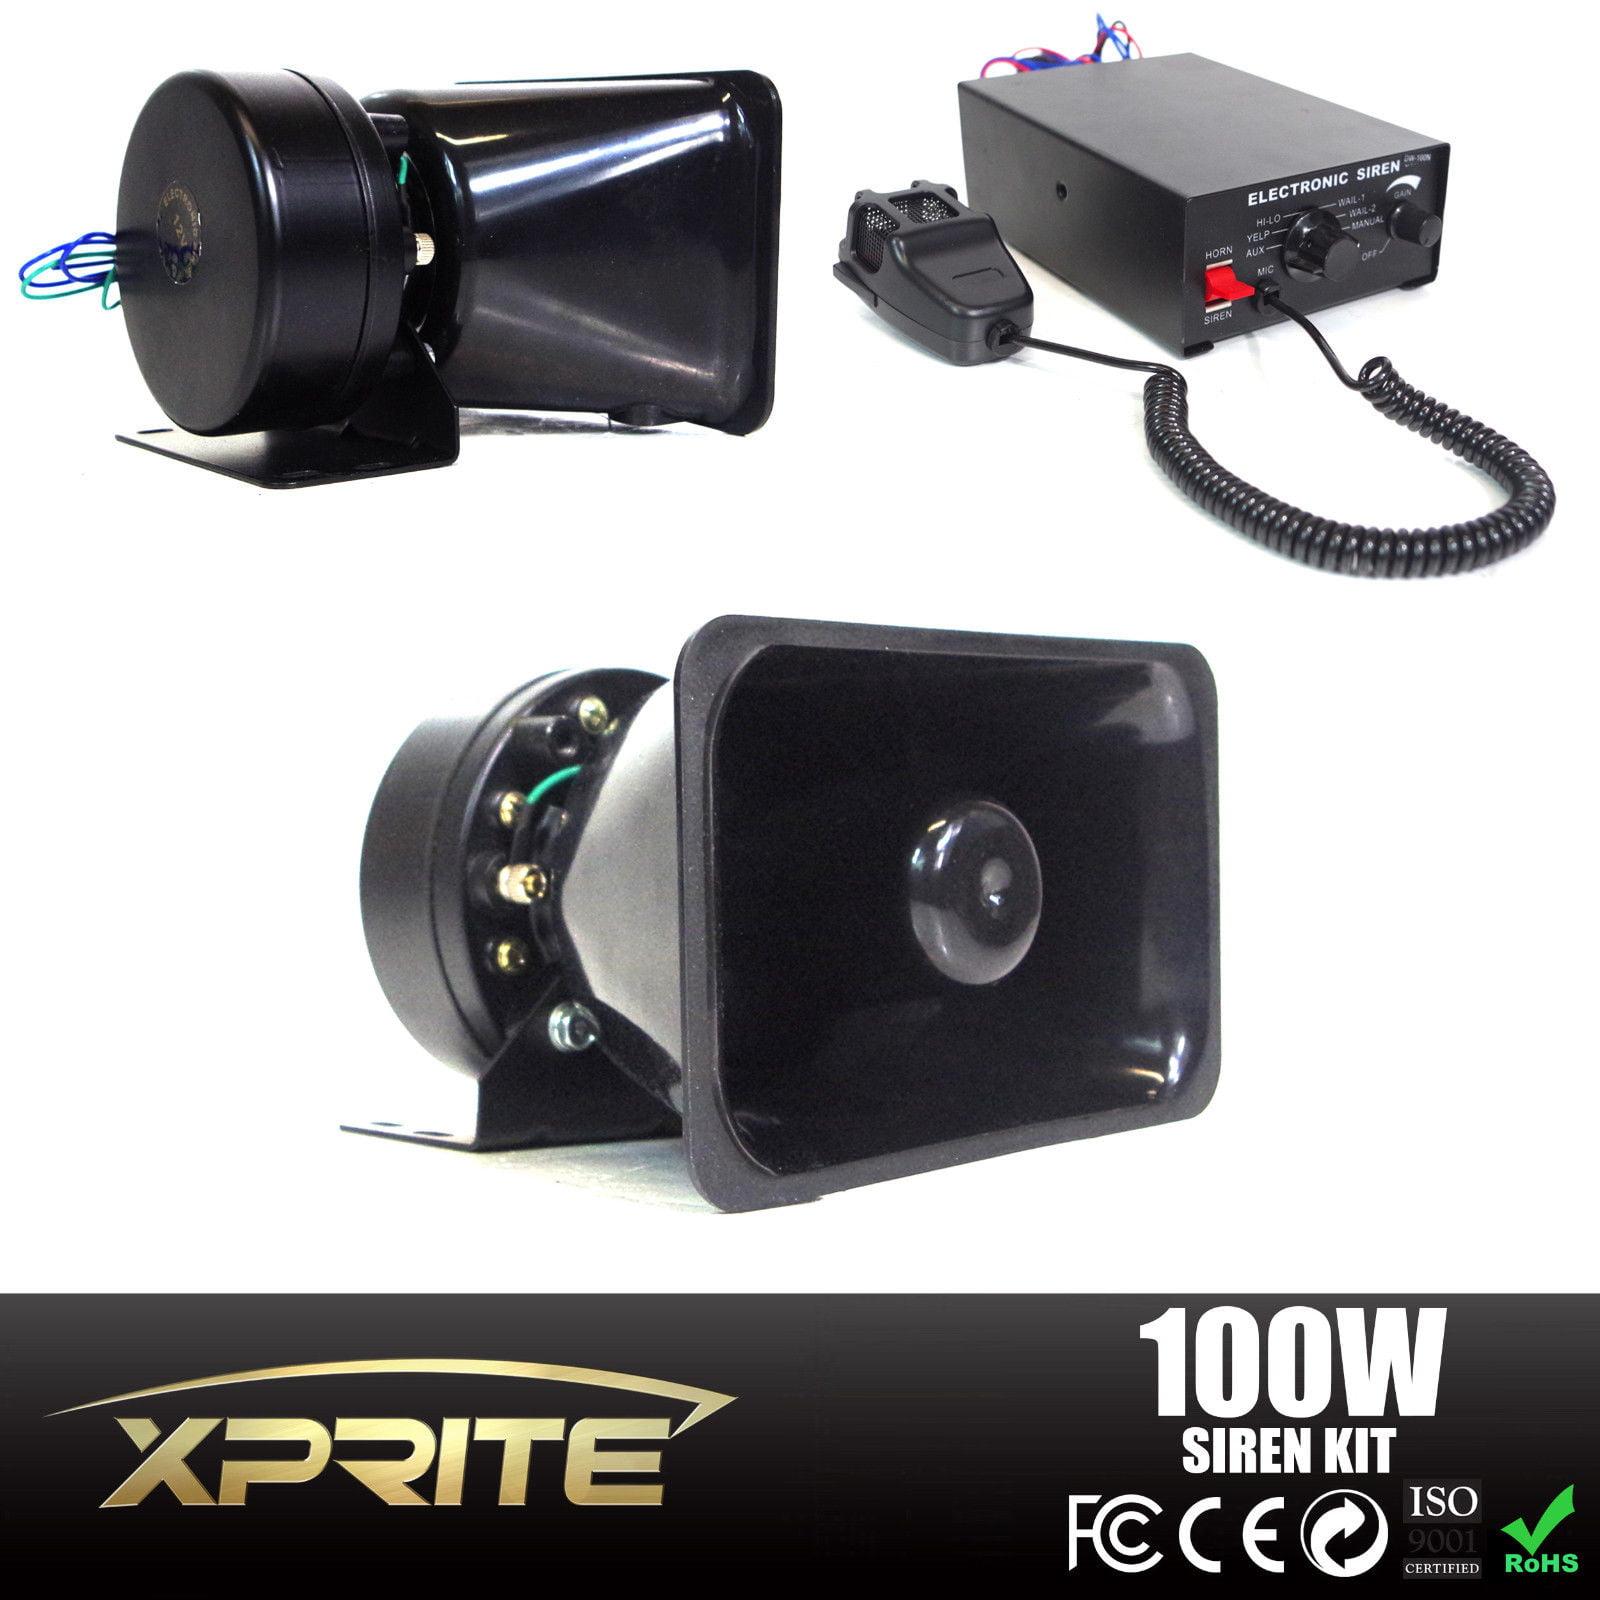 Xprite 100w Siren Pa Speaker System W Handheld Microphone Electronic